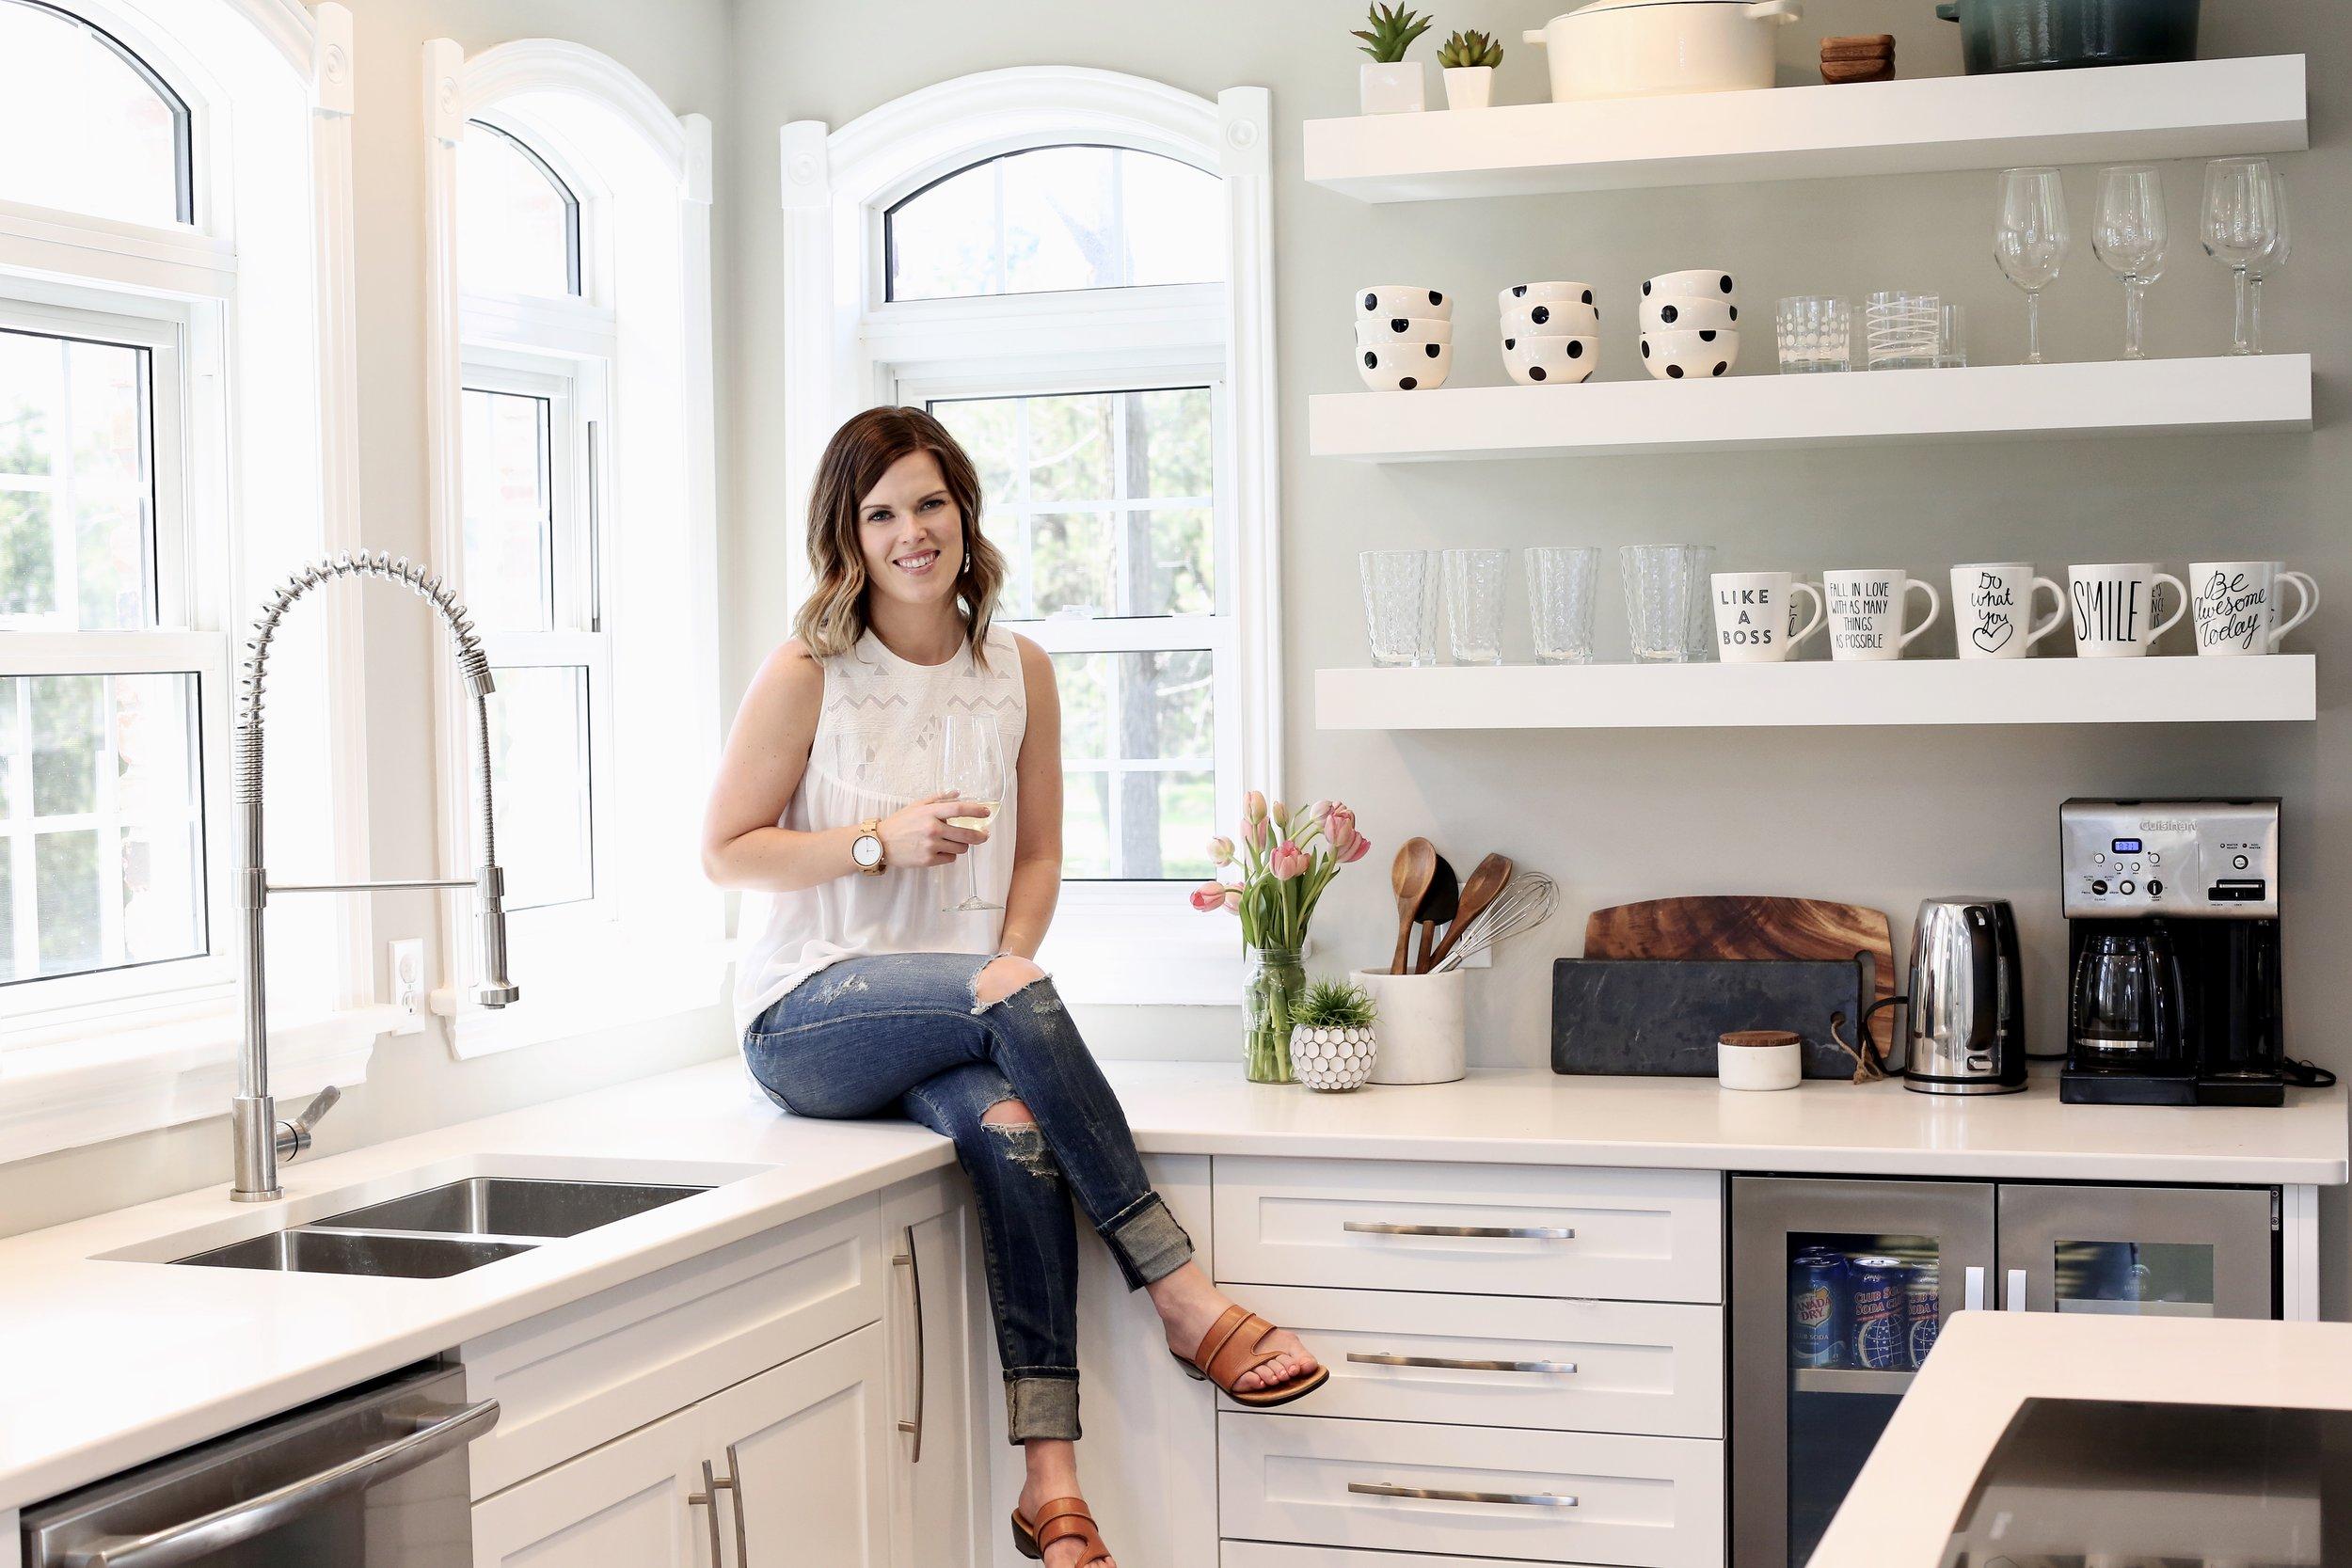 Jamie Scrimgeour - How I Keep A Clean House